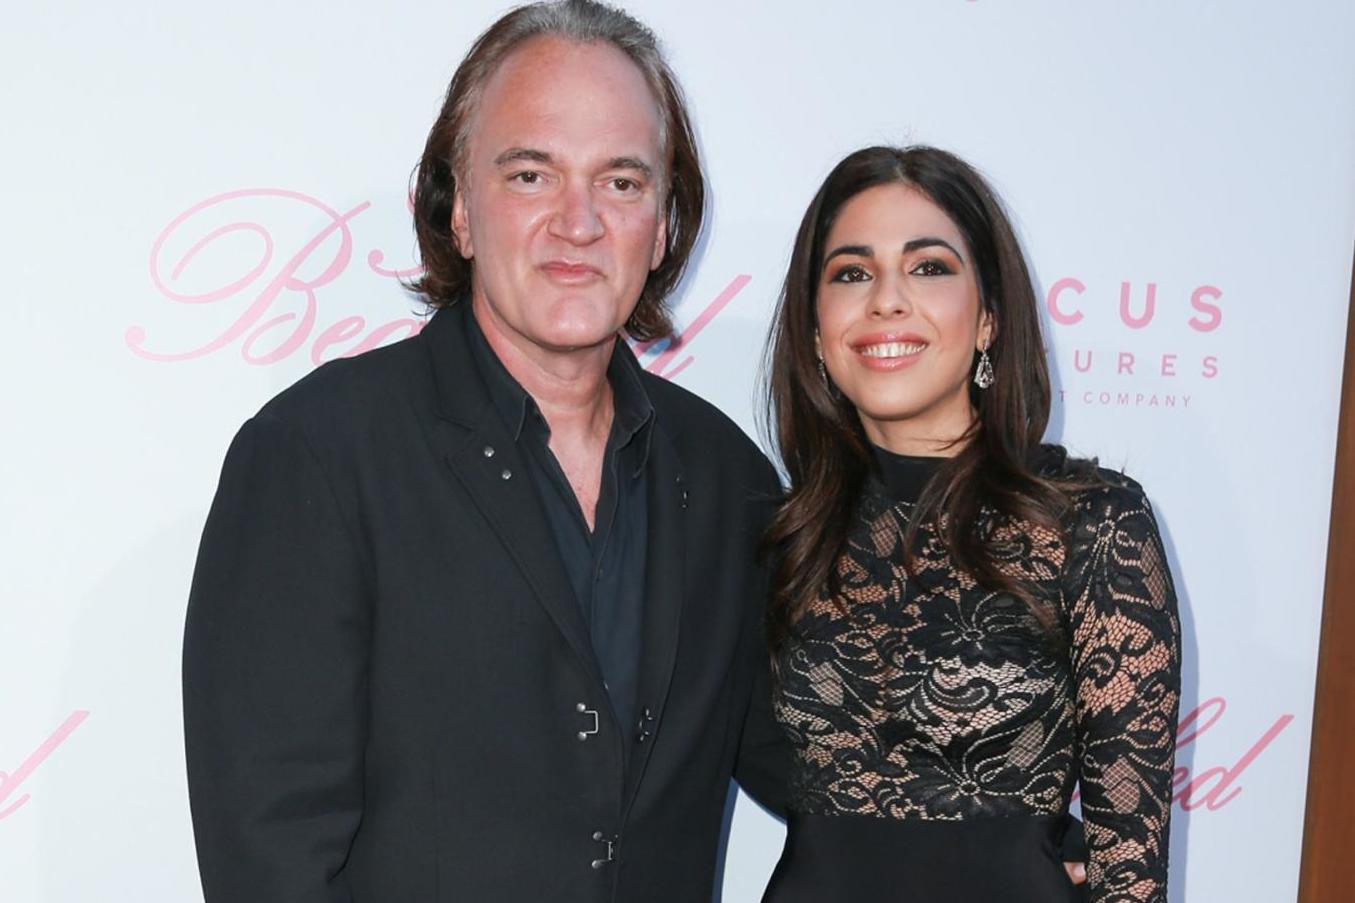 Quentin Tarantino marries Daniella Pick in Los Angeles